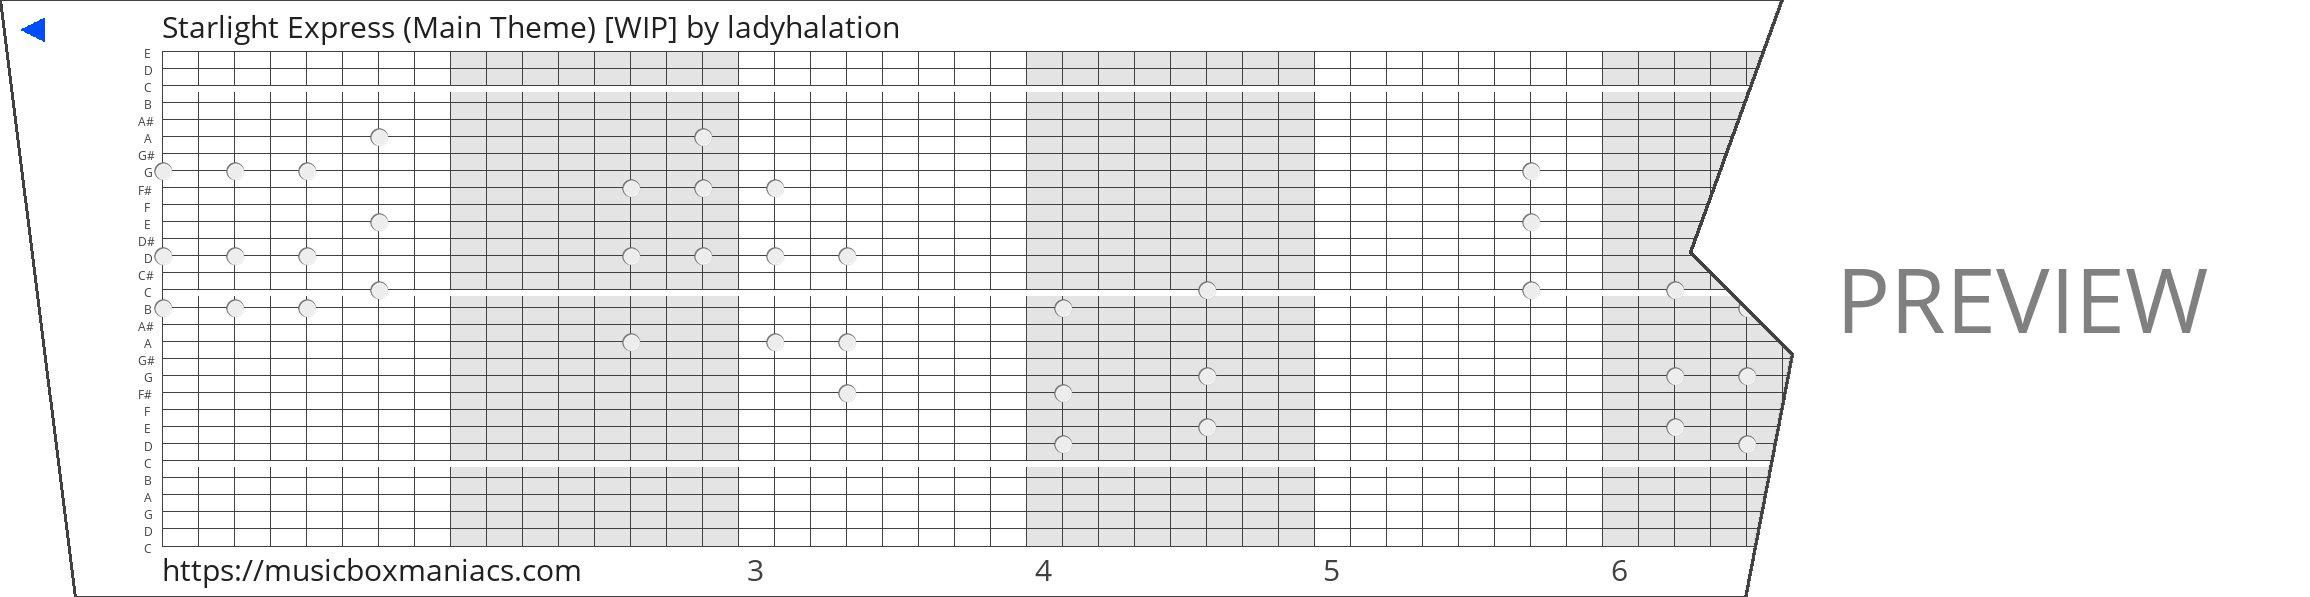 Starlight Express (Main Theme) [WIP] 30 note music box paper strip